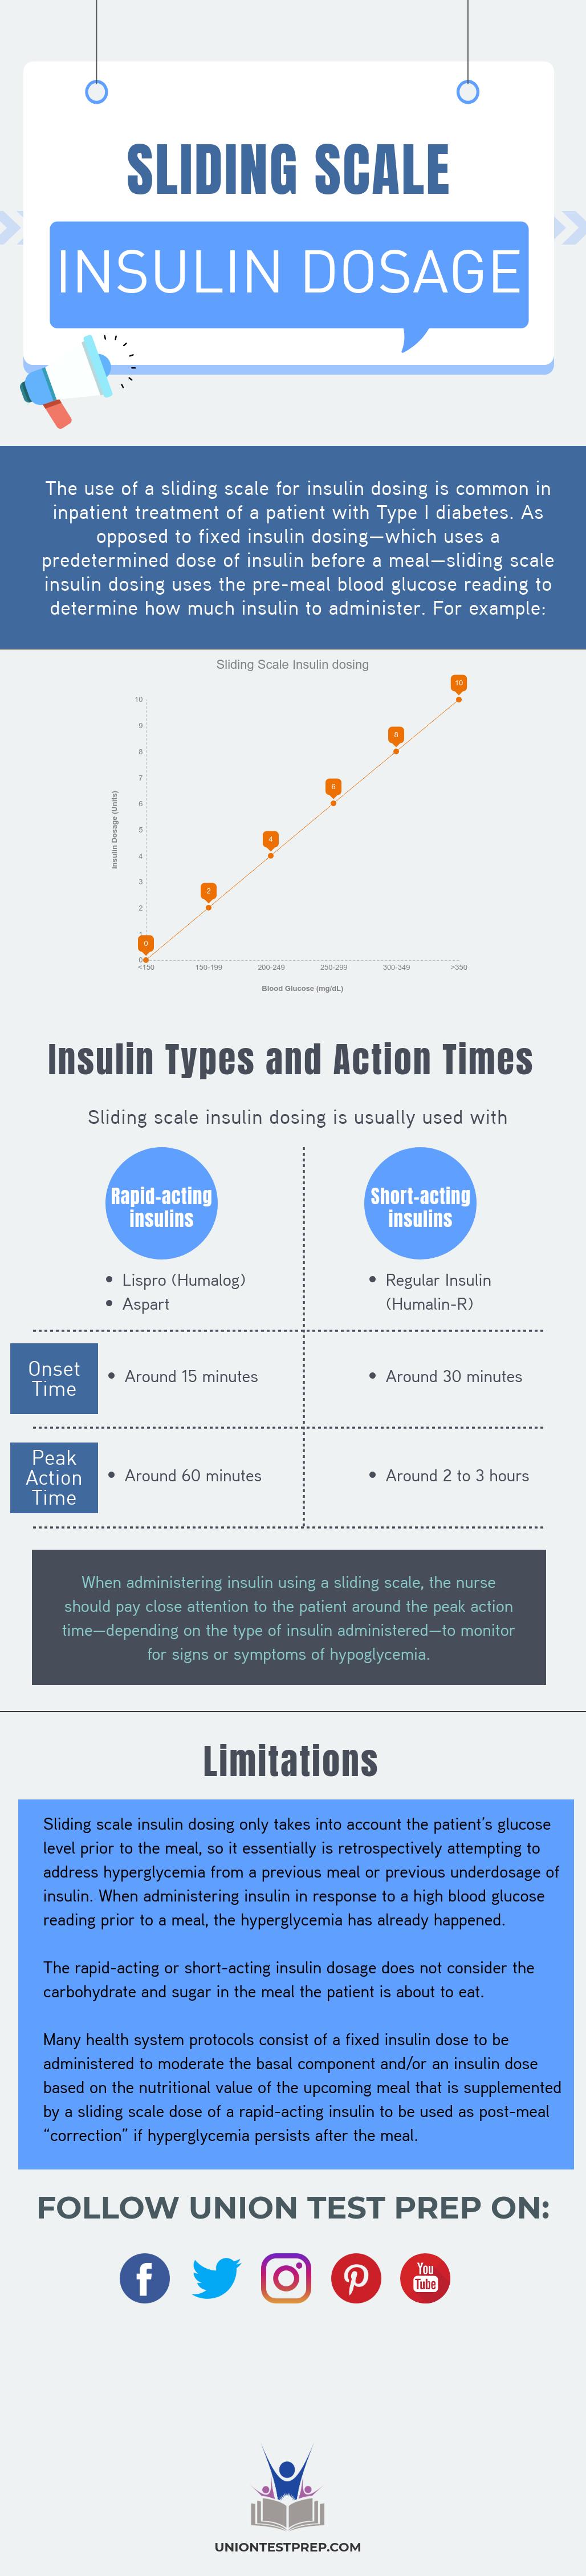 Sliding Scale Insulin Dosage